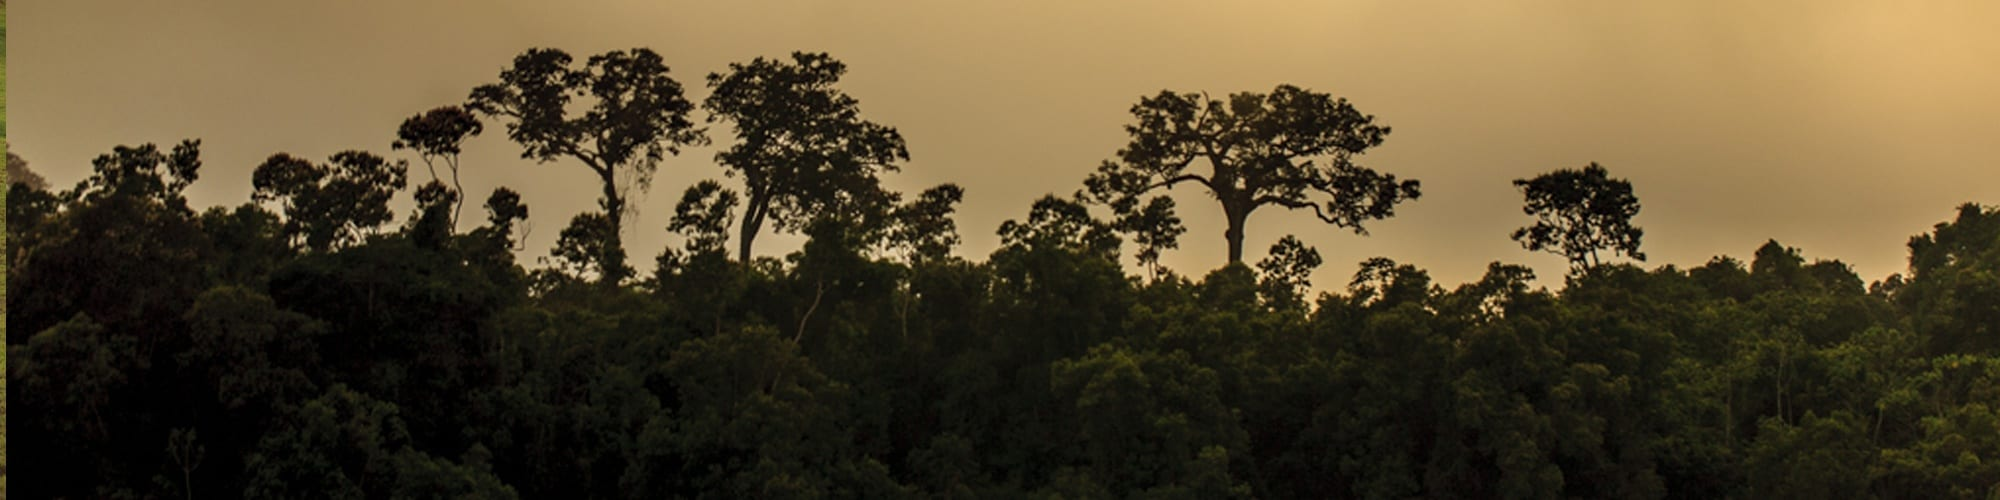 areas protegidas - Protected Areas